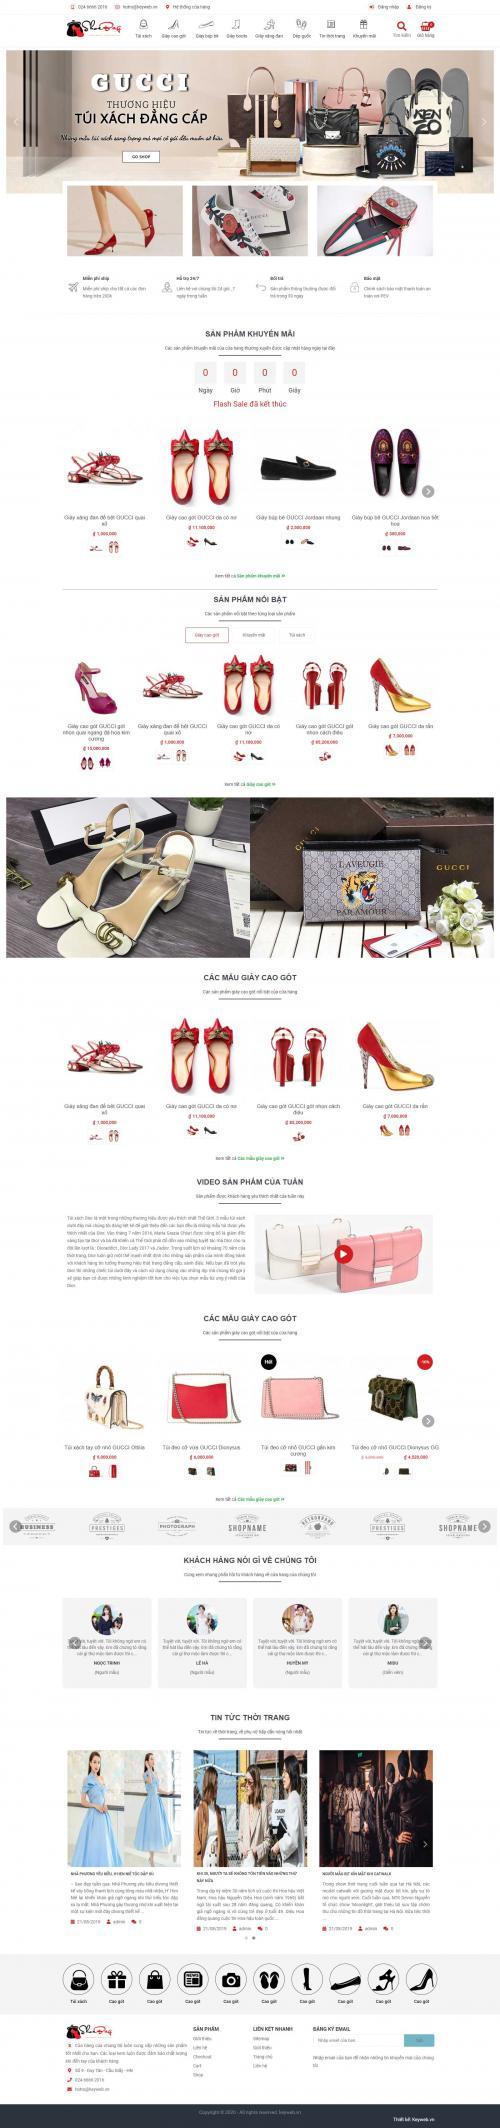 Shop phụ kiện thời trang ShoeBag